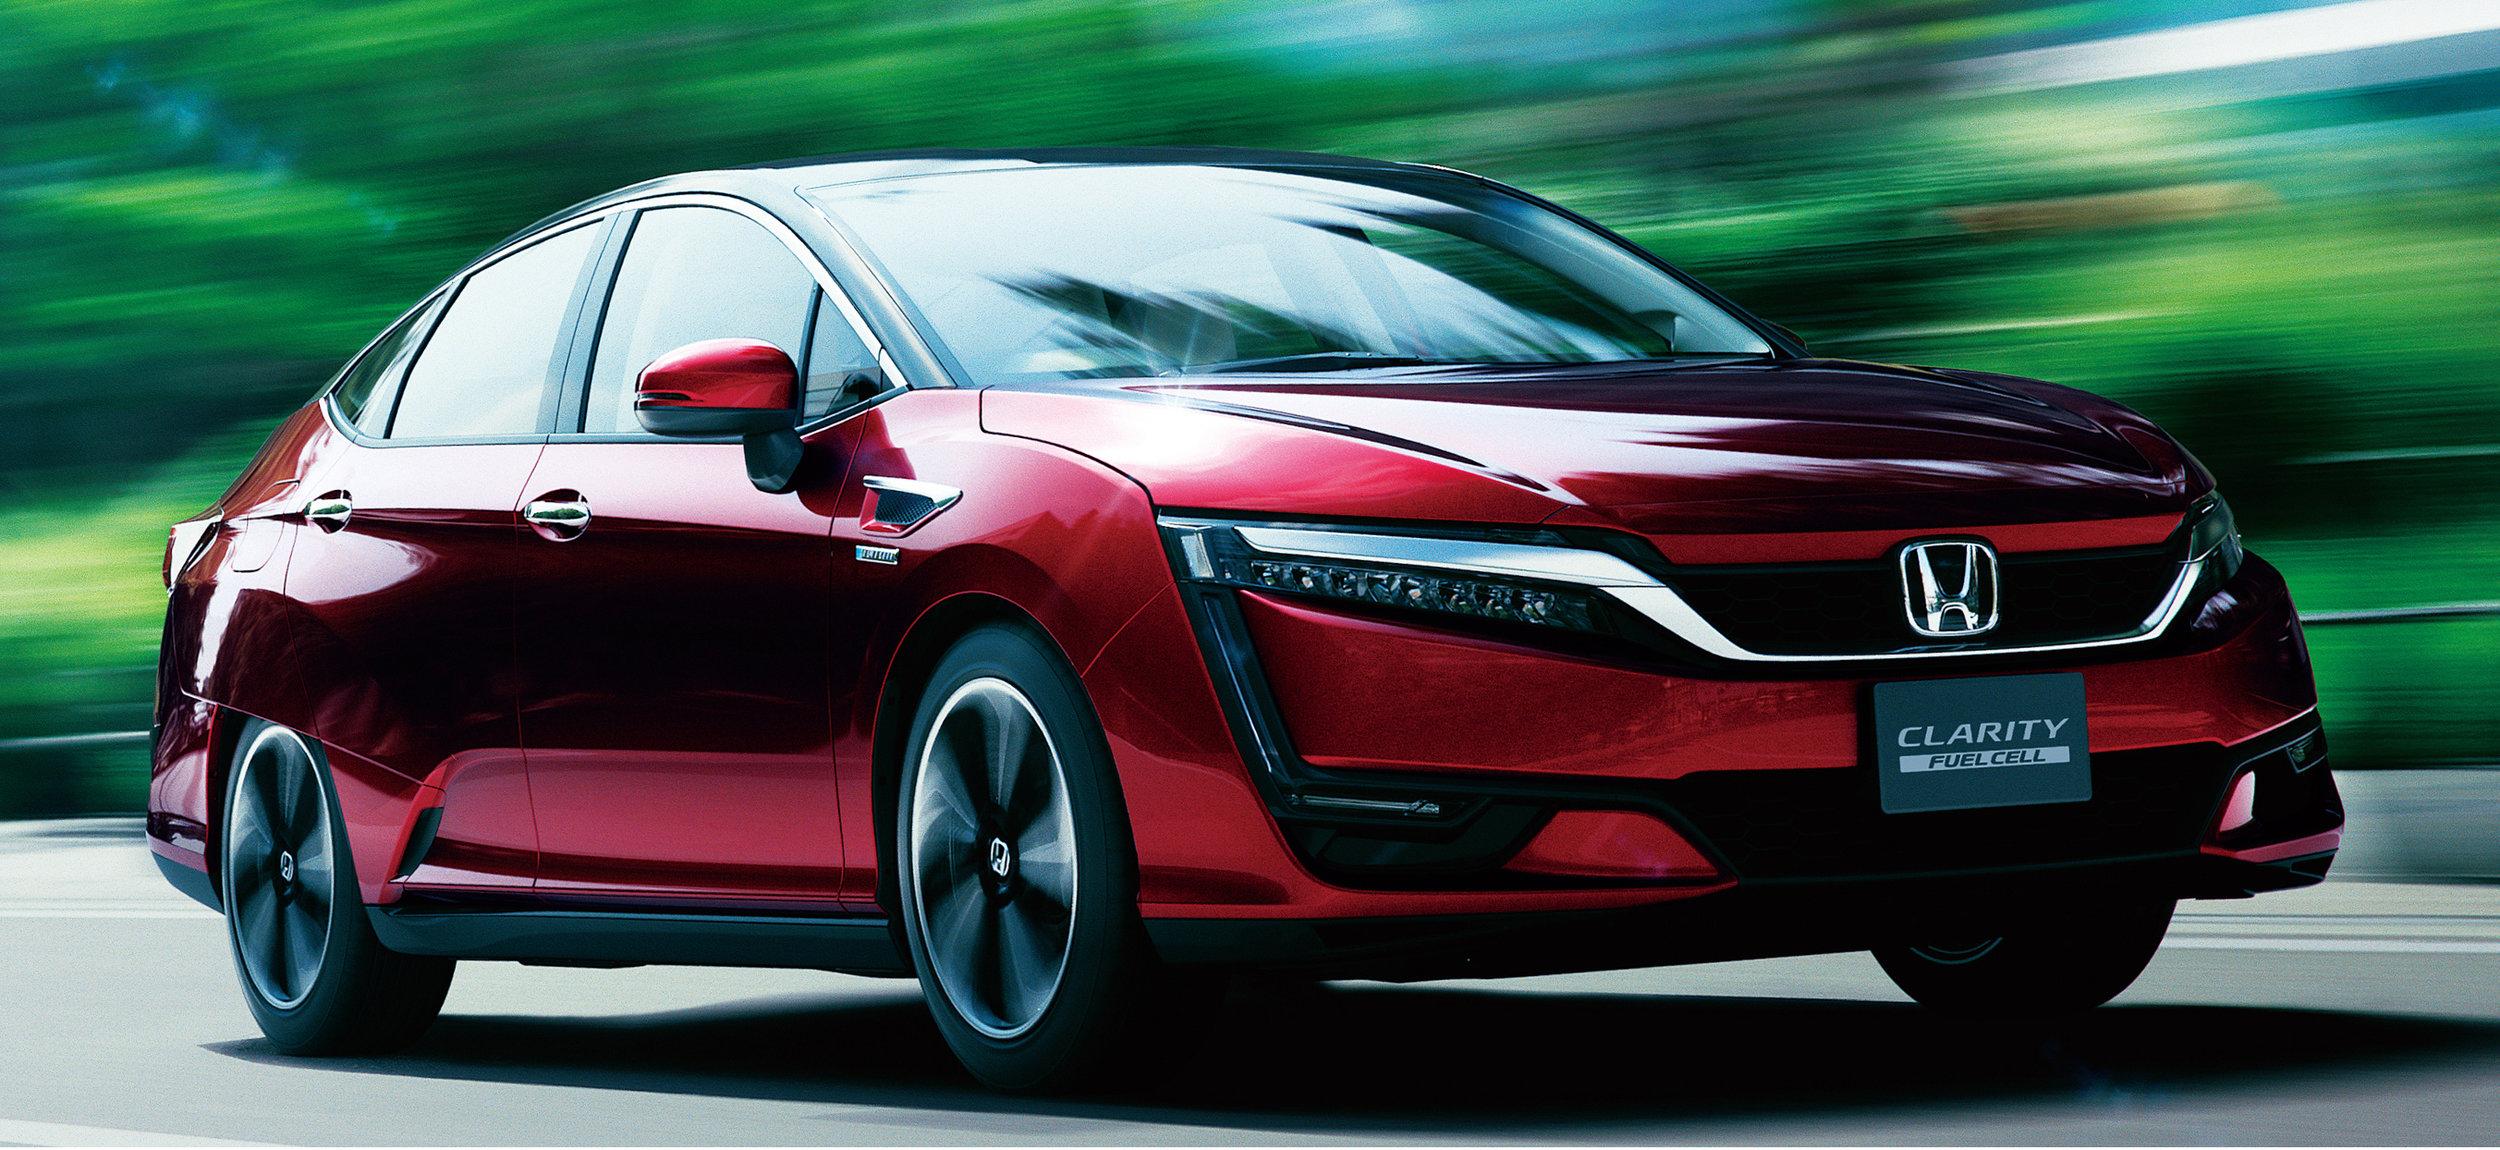 2016 Honda Clarity Fuel Cell Vehicle